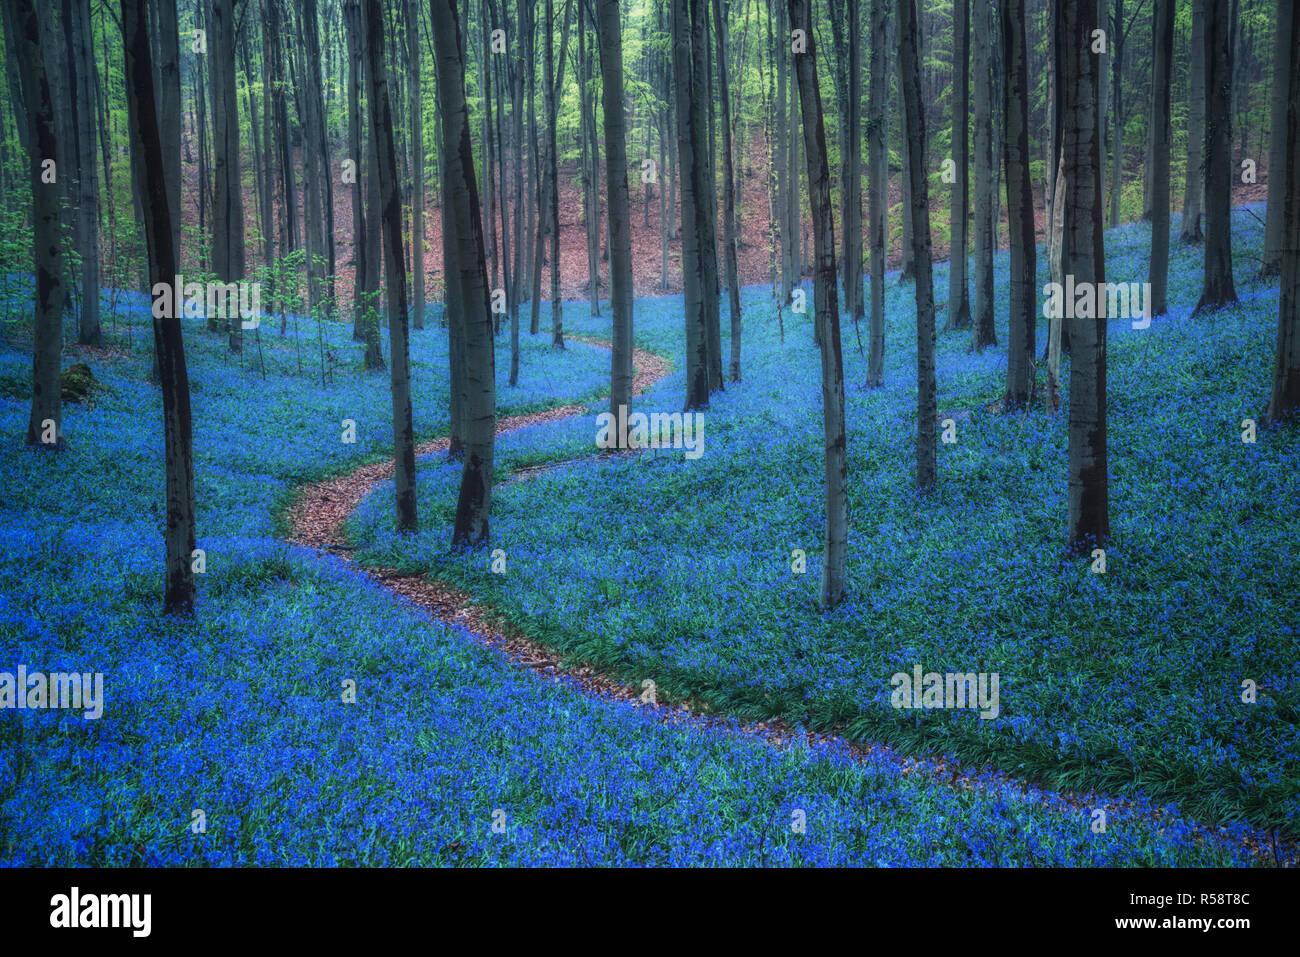 Blue Hour sur Bluebells, Hallerbos, Belgique Banque D'Images